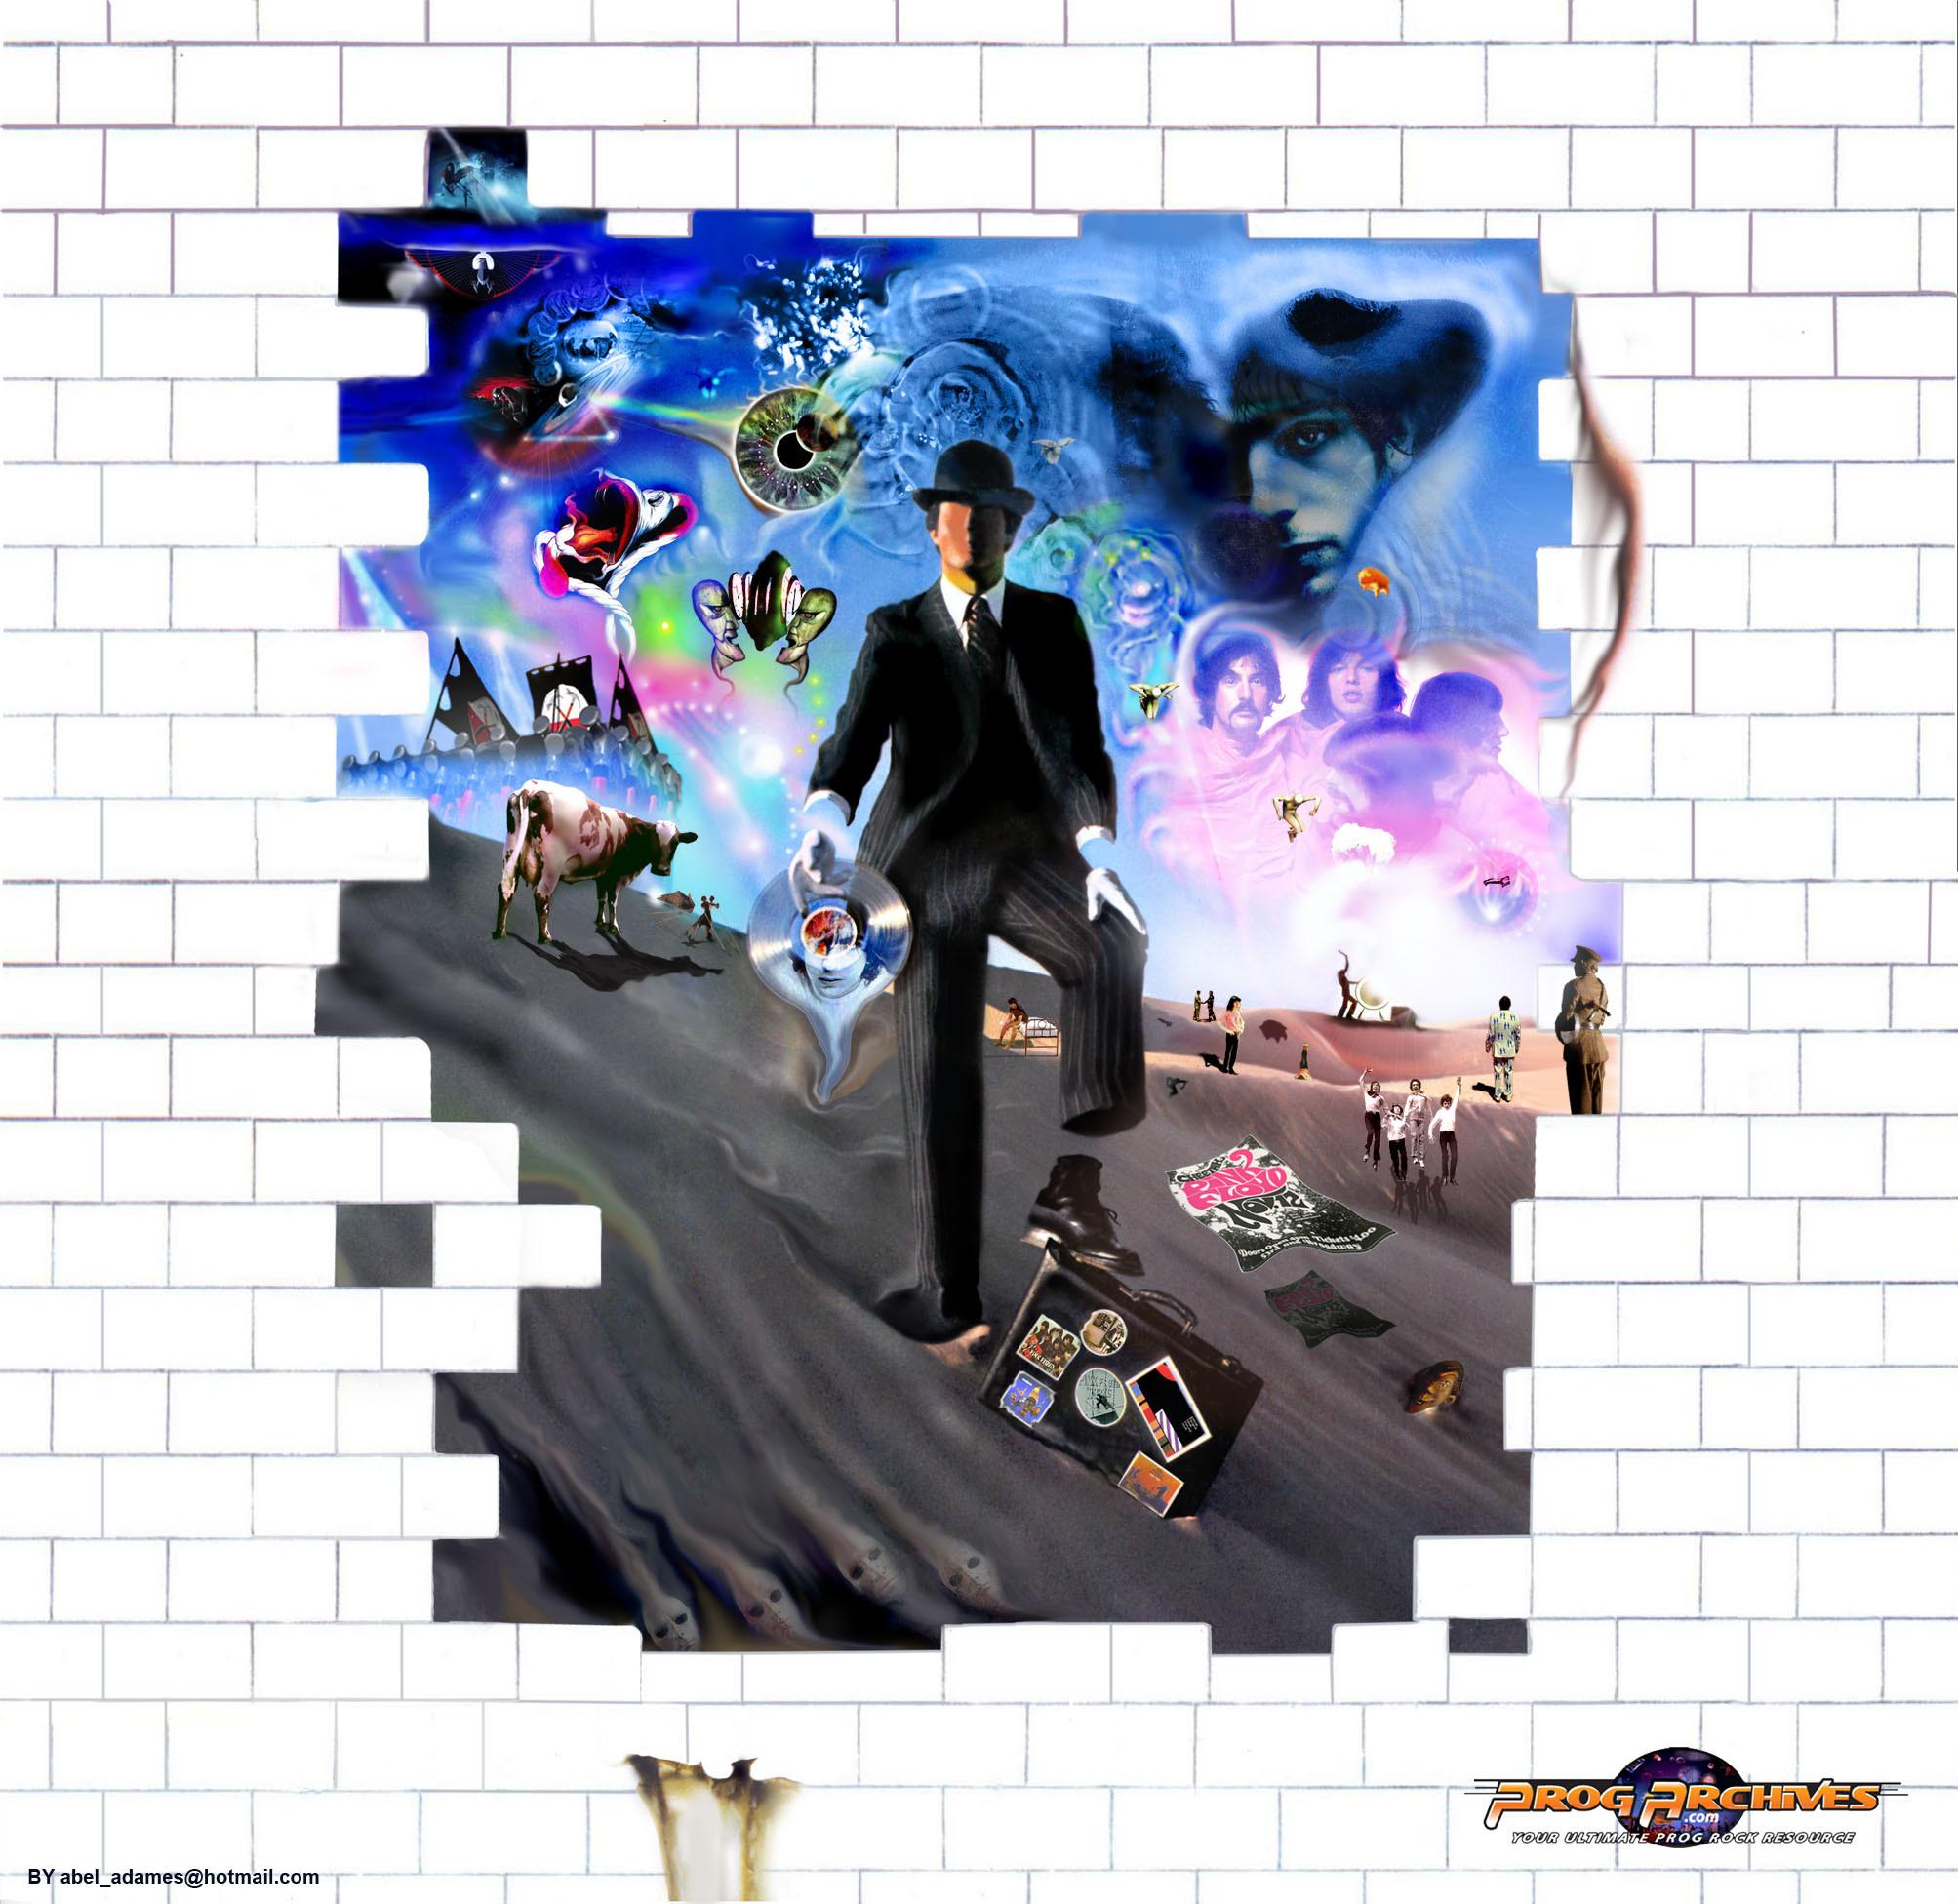 PINK FLOYD Collage by member (darksideof) | Download wallpaper